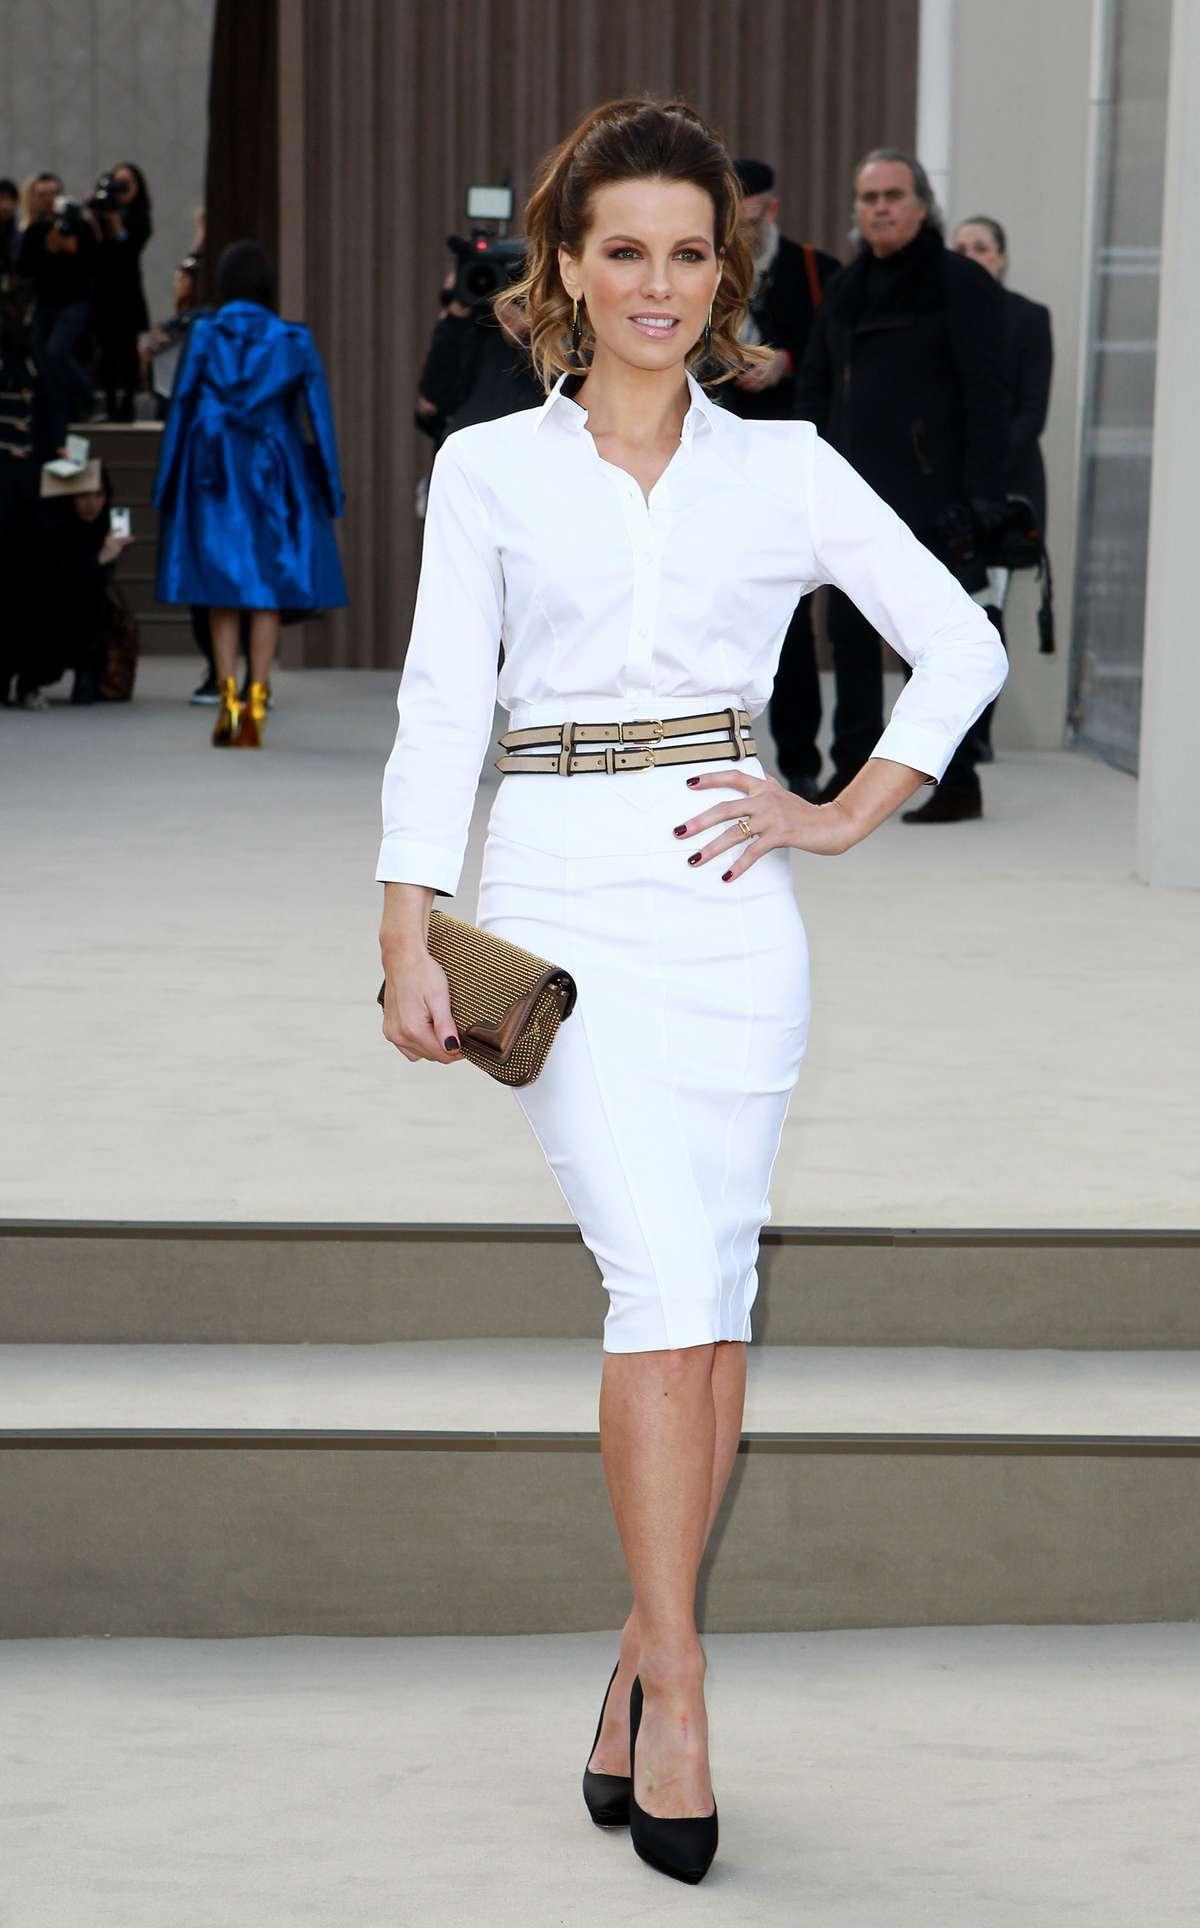 Kate Beckinsale 2013 : Kate Beckinsale In White Tight Skirt -17